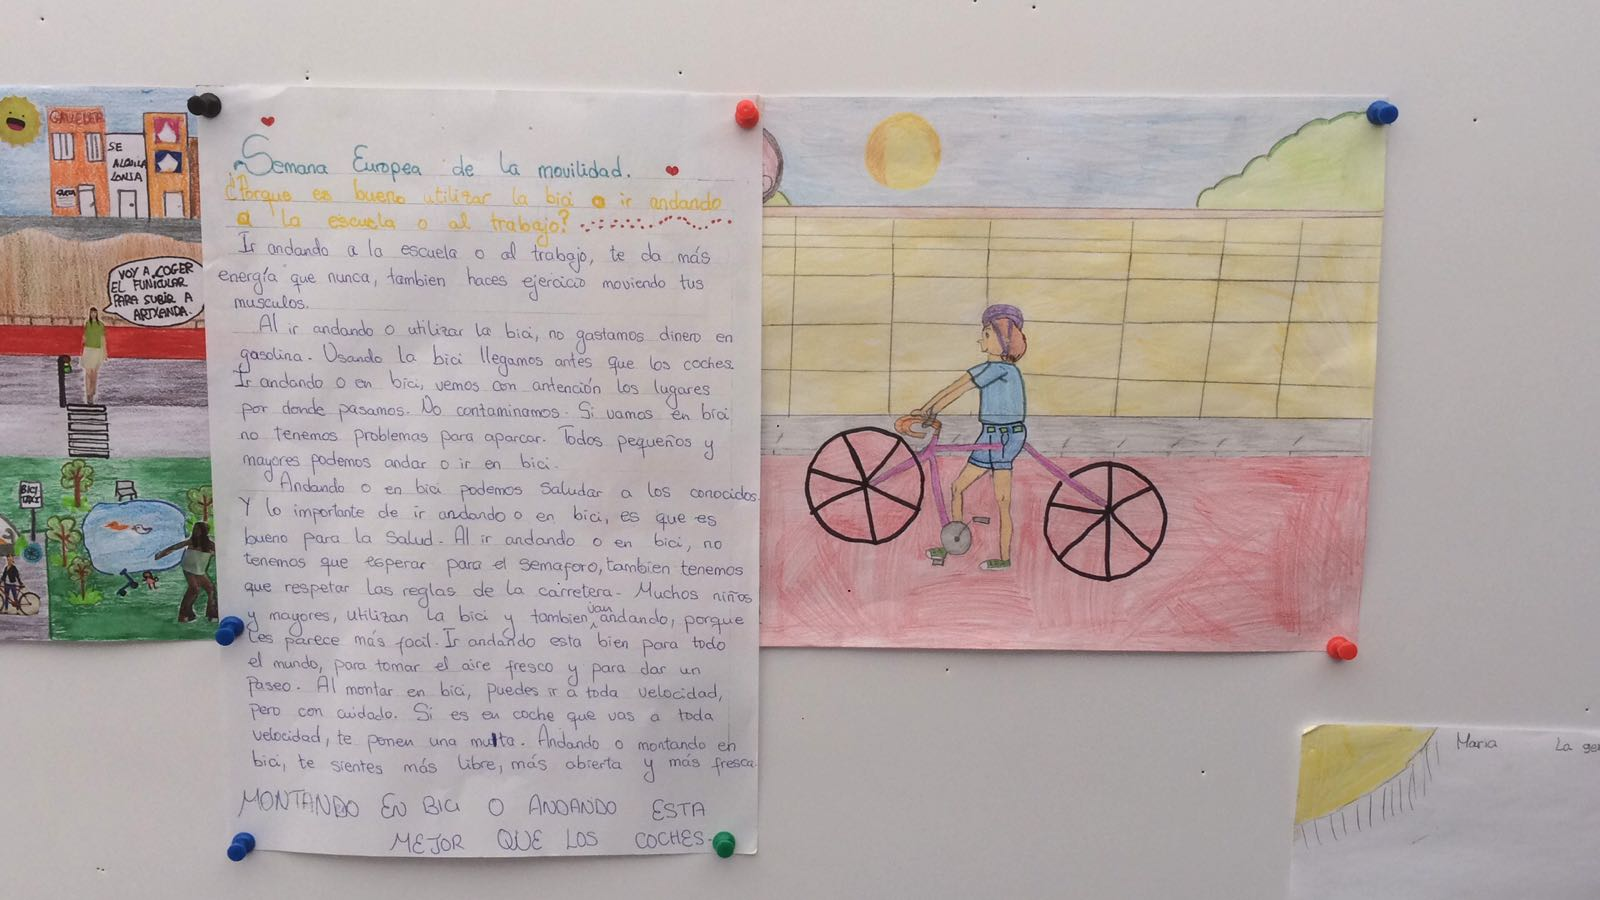 http://bilbaosinmicoche.net/wp-content/uploads/2016/09/Segundo-Premio-Lorena-Velazquez-Serna-Colegio-Amor-Misericordioso.jpeg